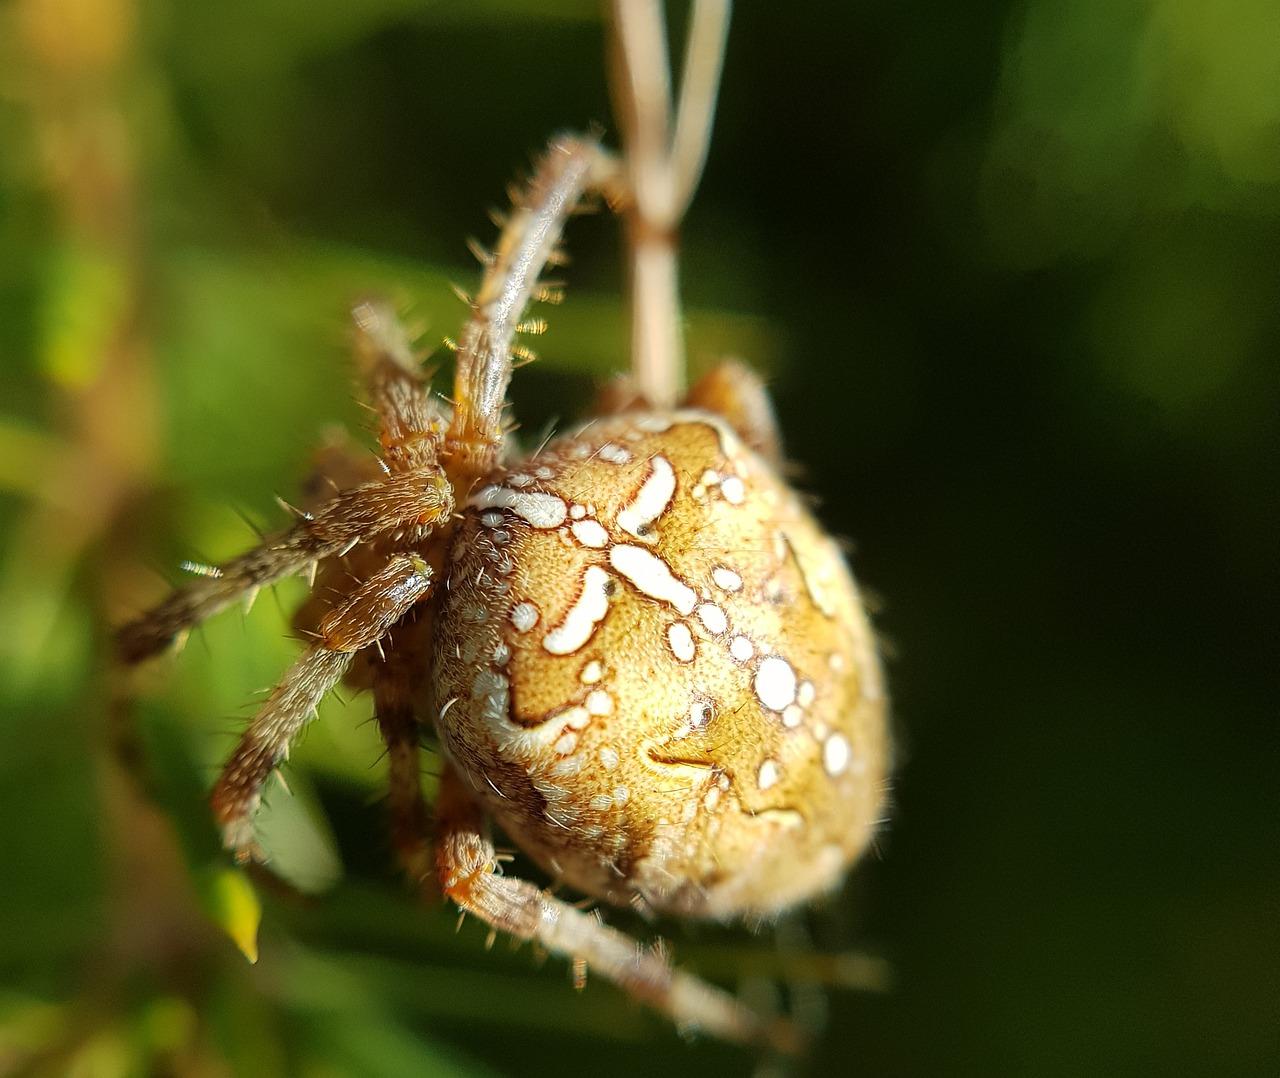 кожи млечный пауки картинки быстро